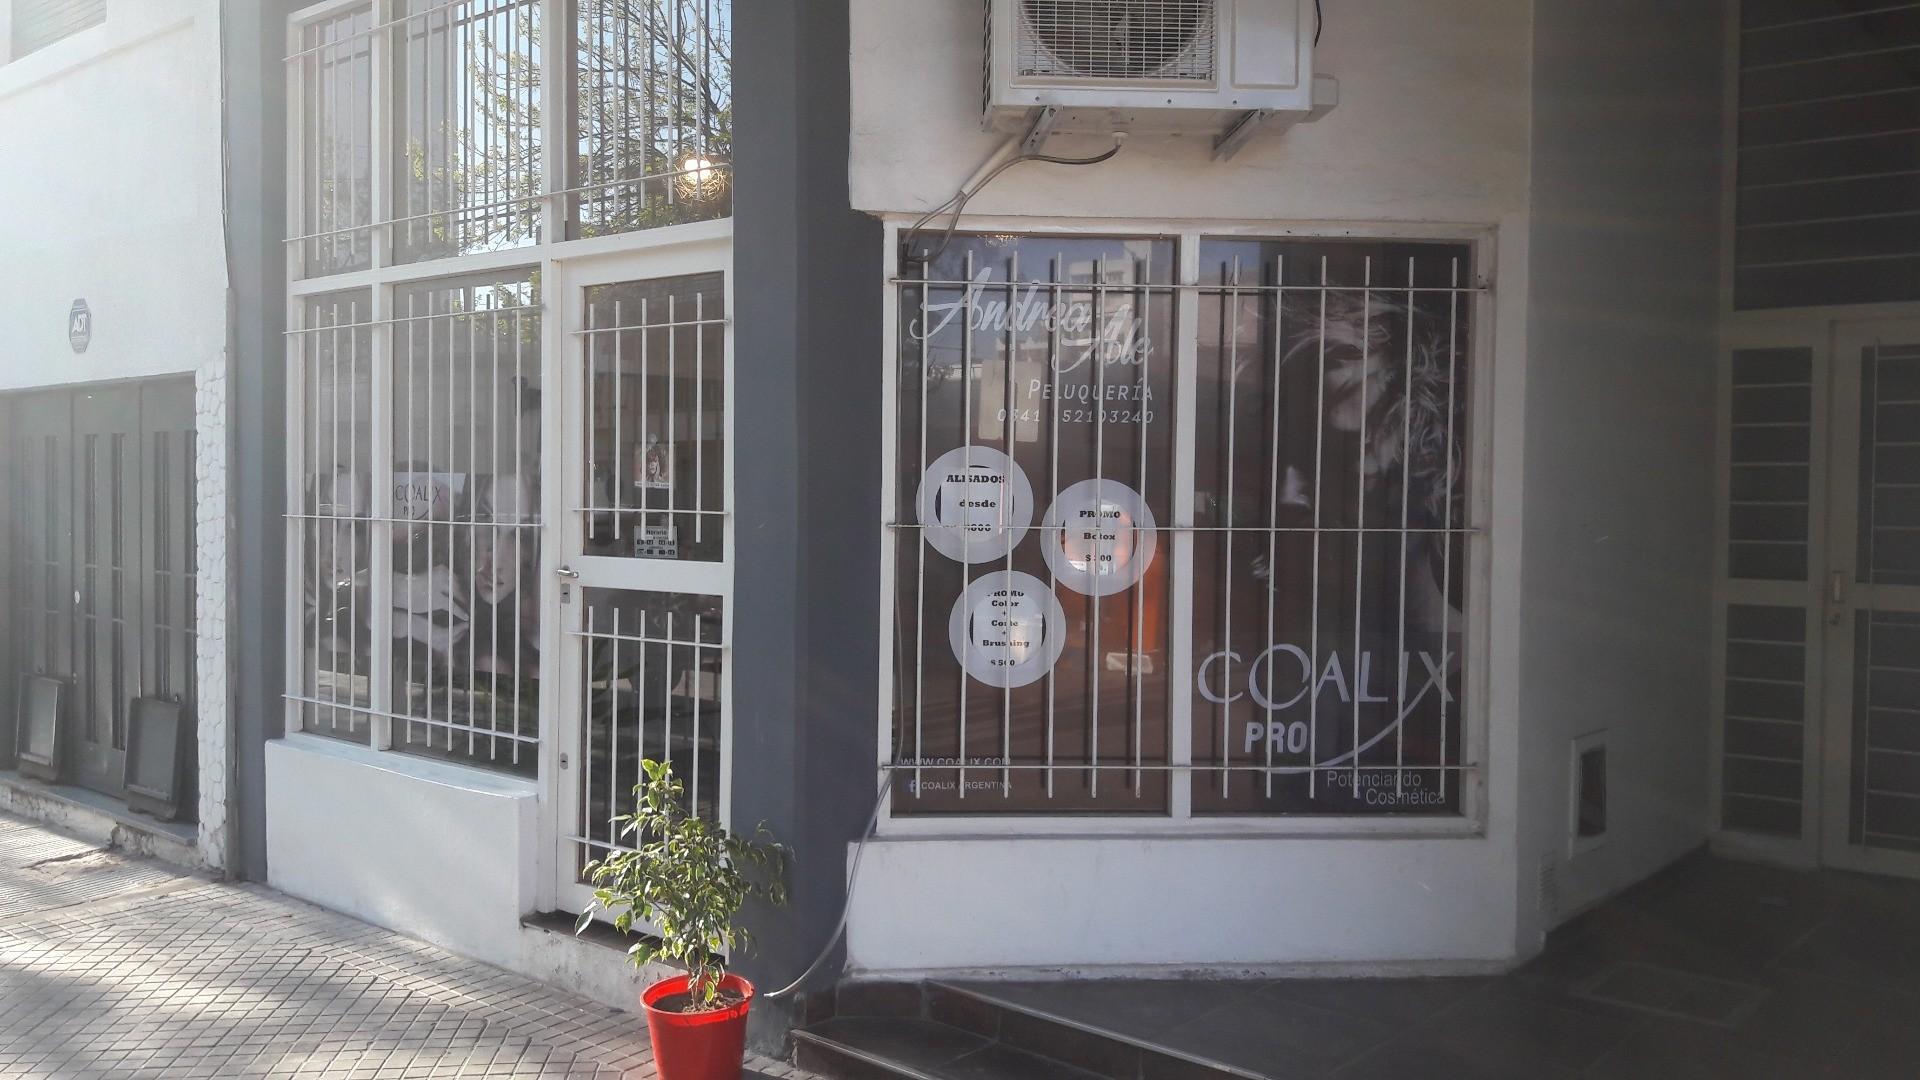 PELUQUERIA NUEVA. UNISEX  ROSARIO, PROX. ESCUELA, . FRENTE AL BANCO